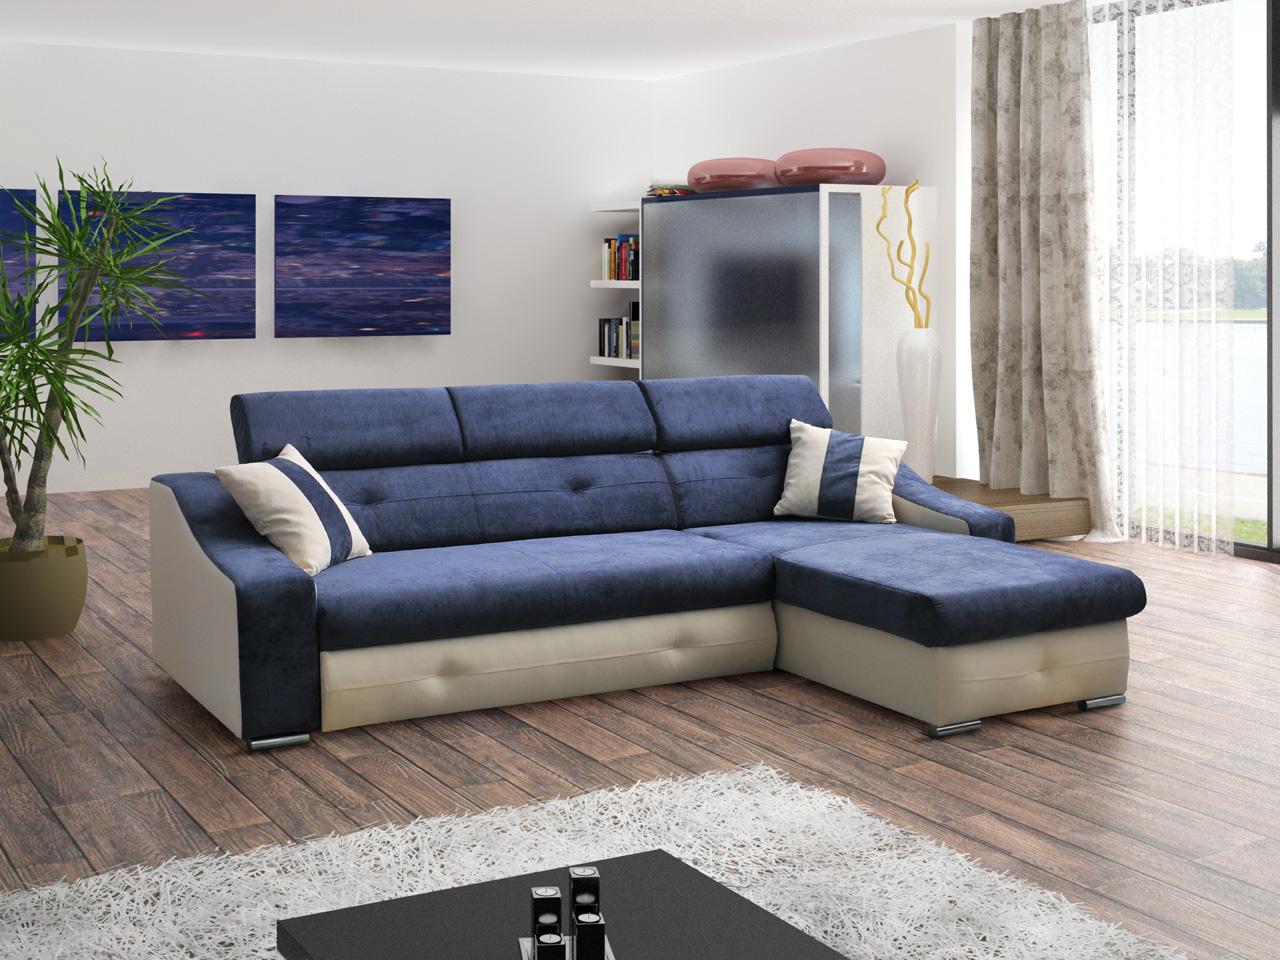 apollo blau r m bel muller braun. Black Bedroom Furniture Sets. Home Design Ideas